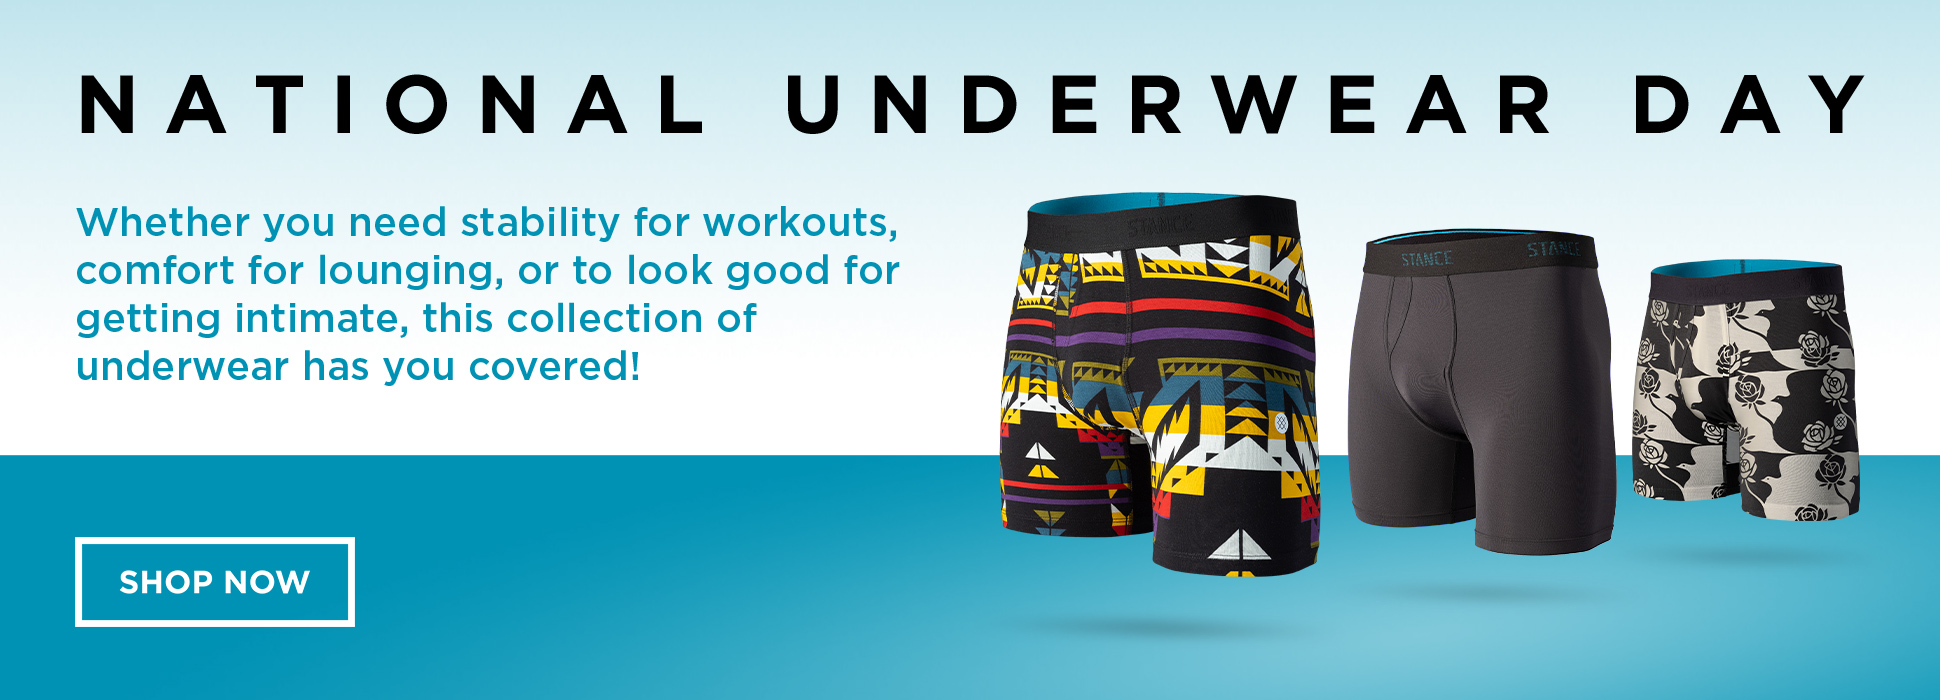 National Underwear Day (Banners)